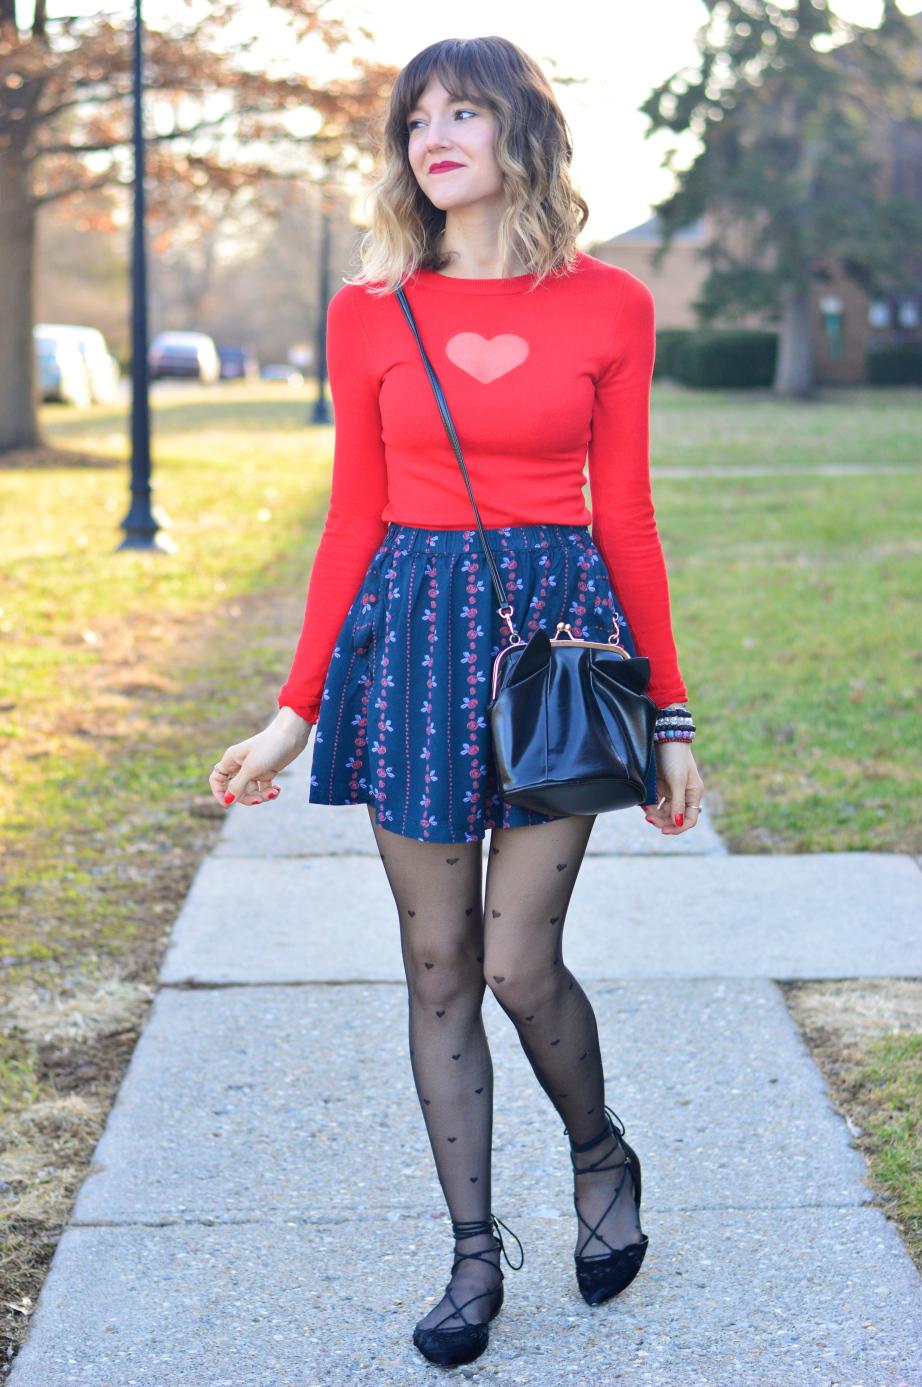 Street Style Legwear Looks Fashionmylegs The Tights And Hosiery Blog